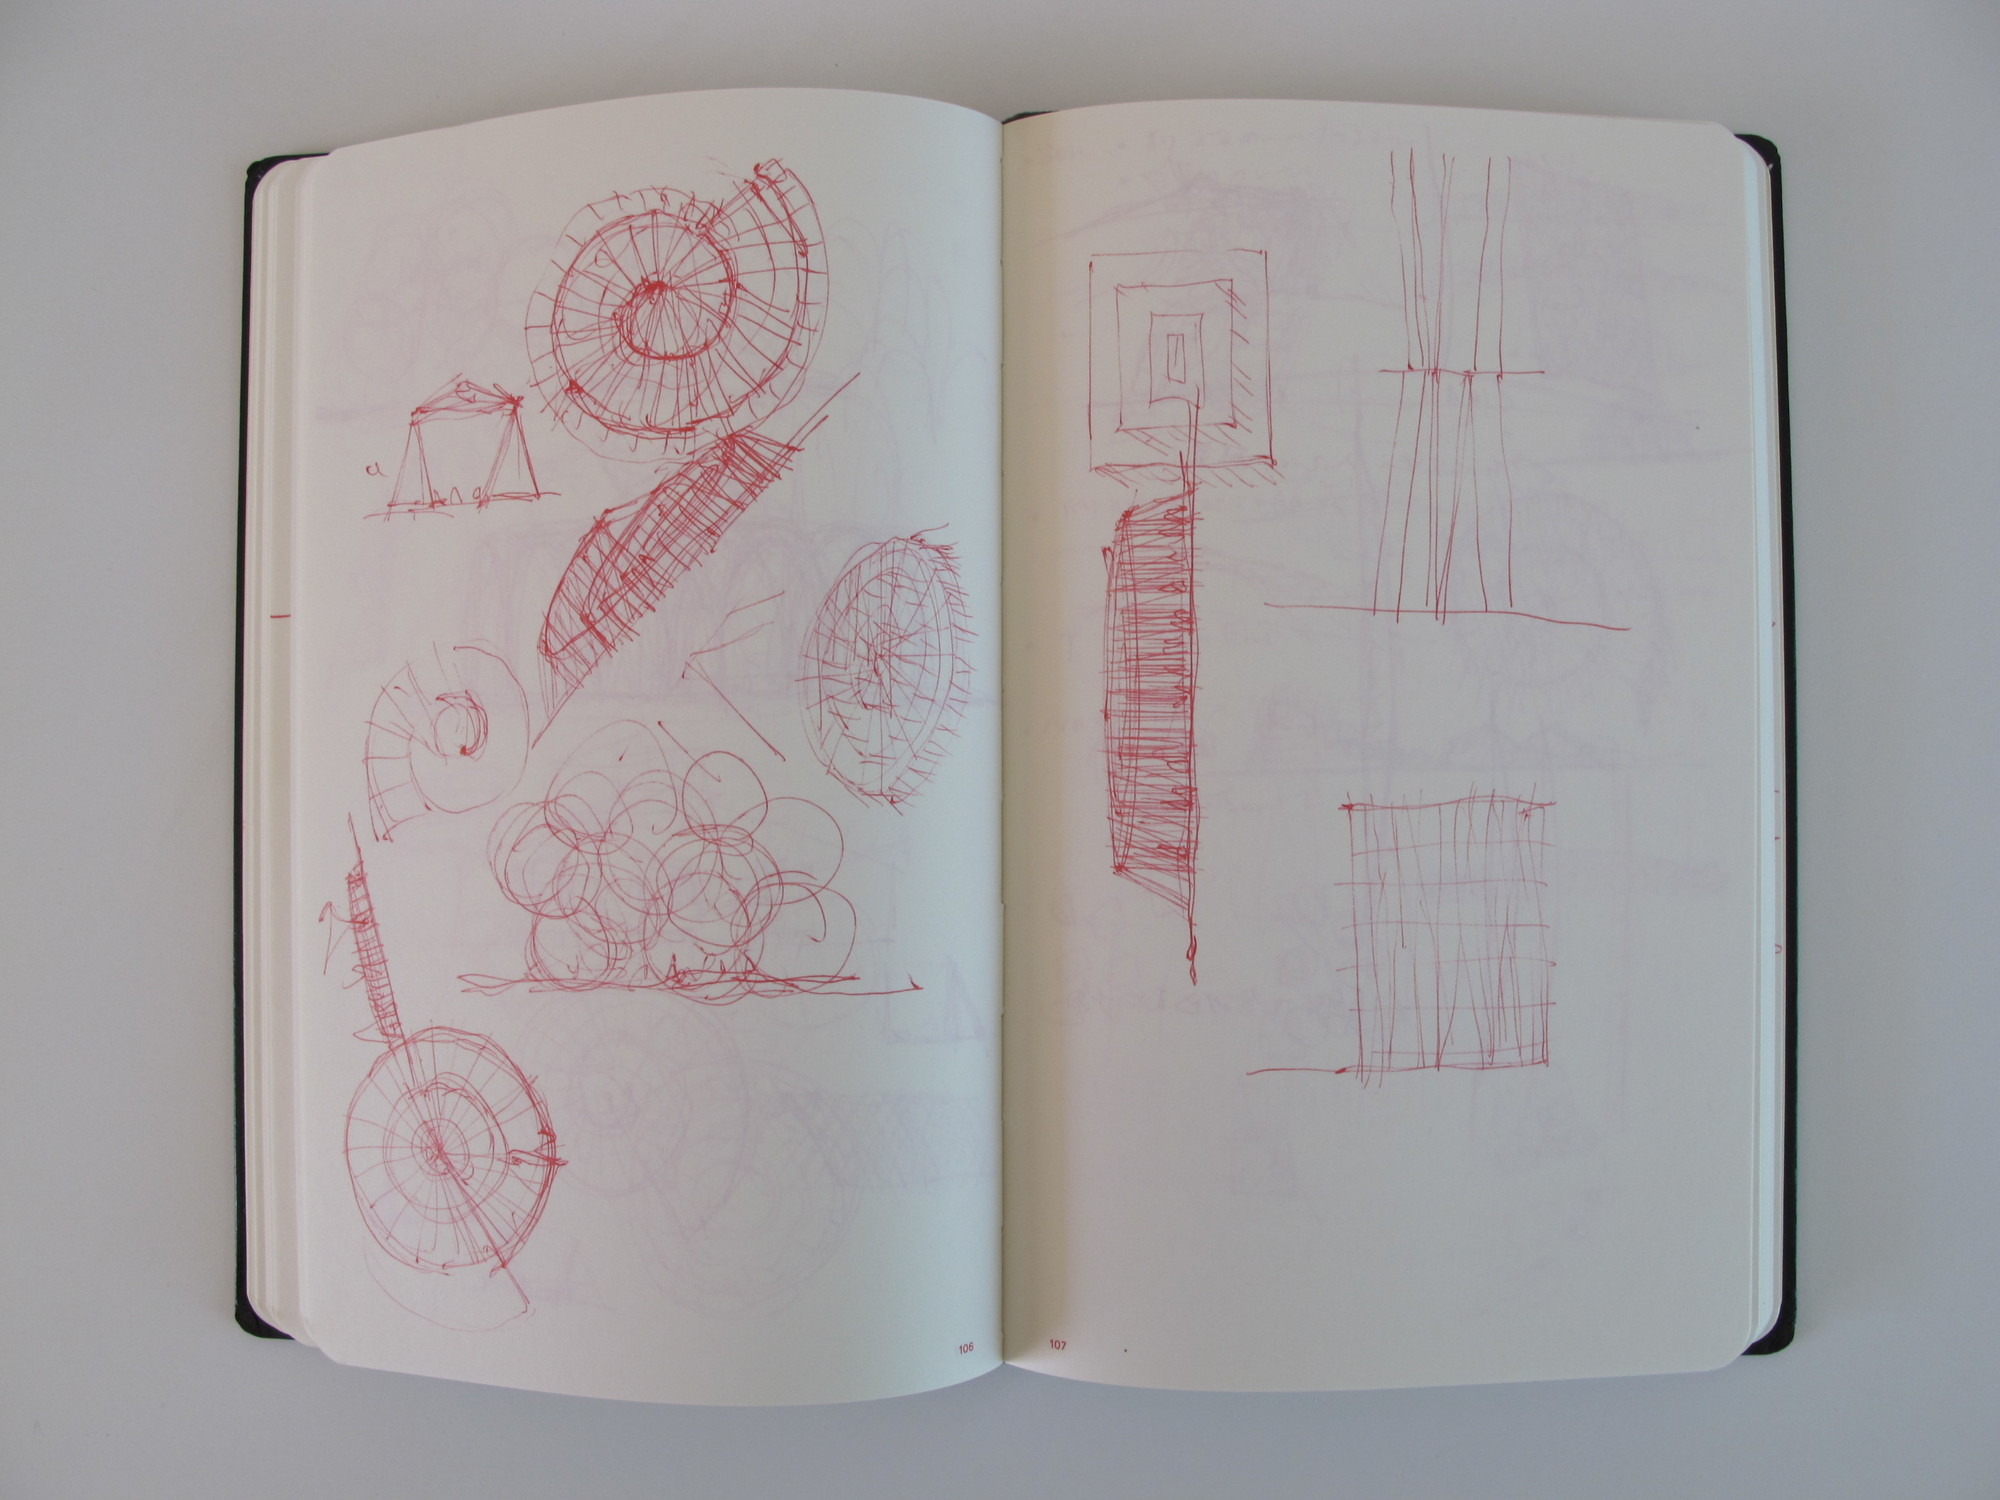 Sou Fujimoto: Sketchbook